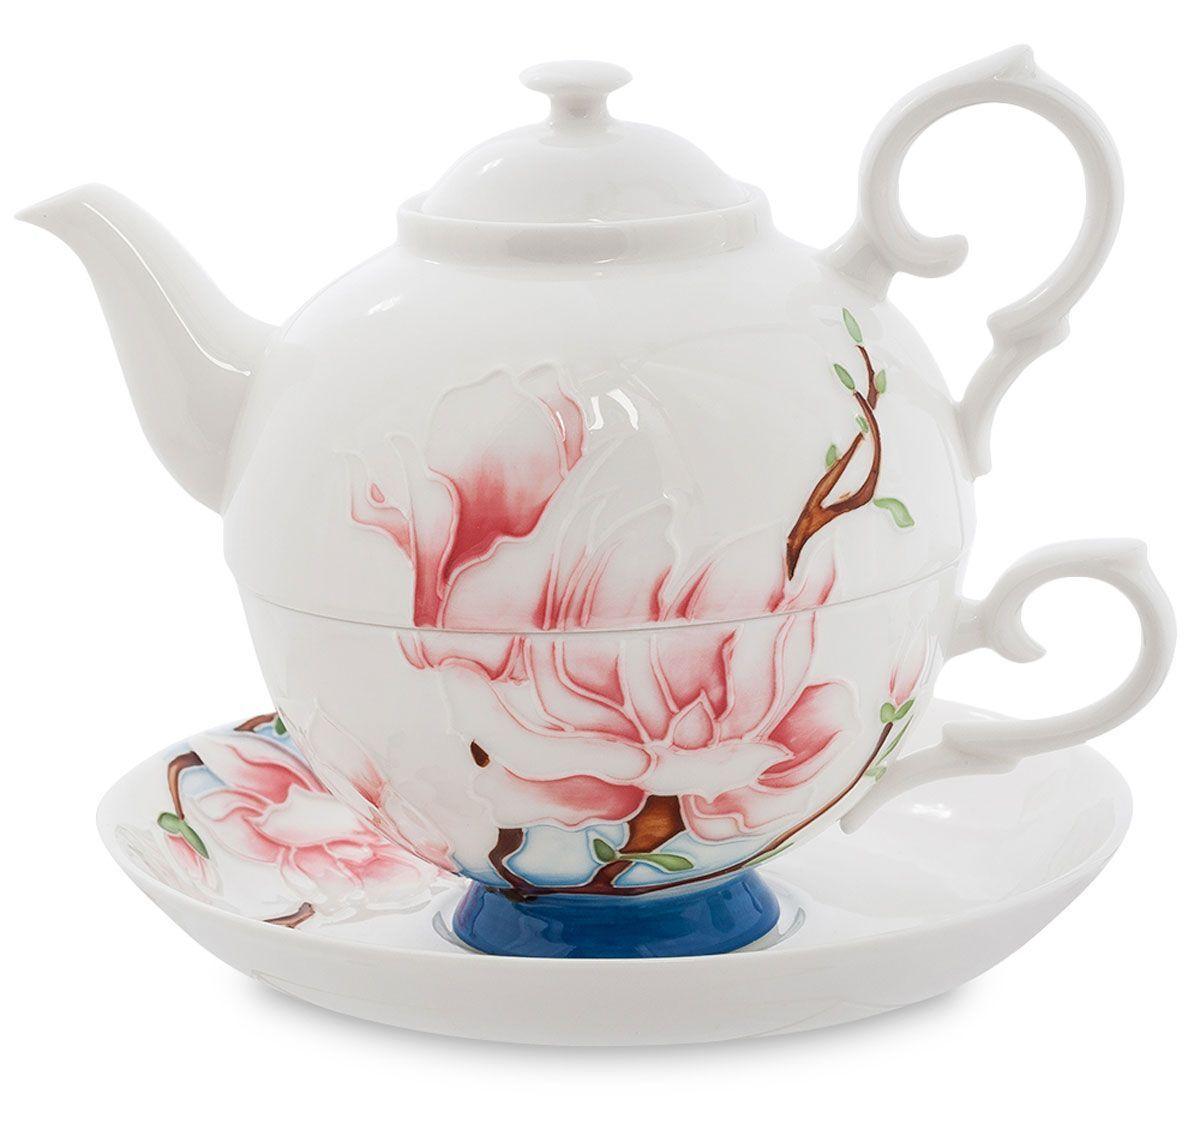 Набор чайный Pavone Цветущая сакура, 3 предмета. 451575451575Объем чайника: 400 мл Объем чаши: 250 мл Диаметр блюдца: 15 см